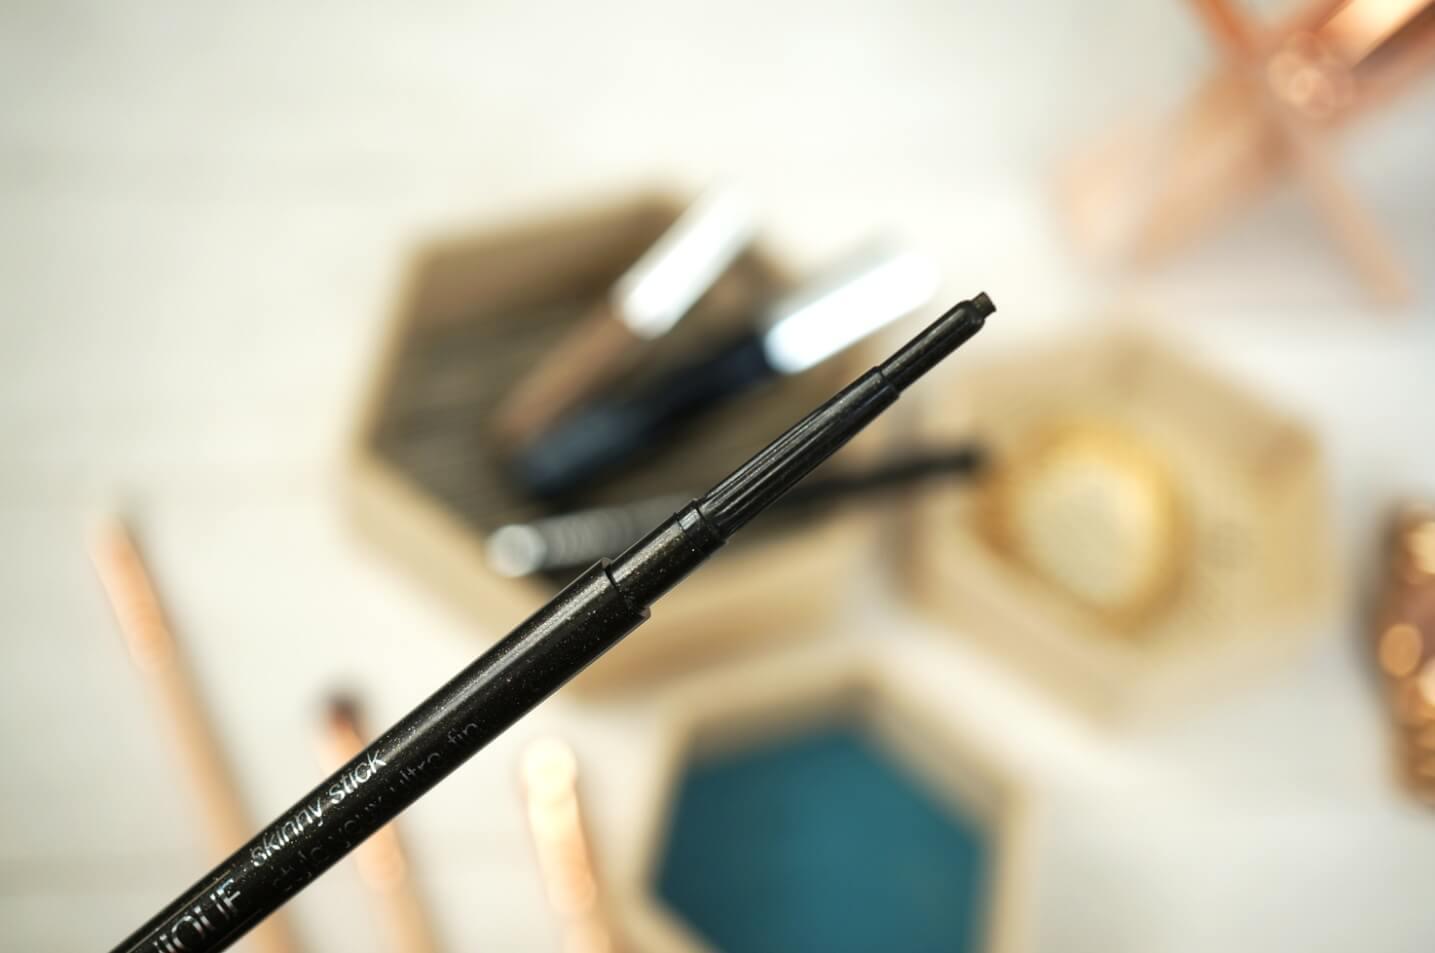 Bút kẻ mắt CLINIQUE Trang điểm mắt Clinique Skinny Stick™